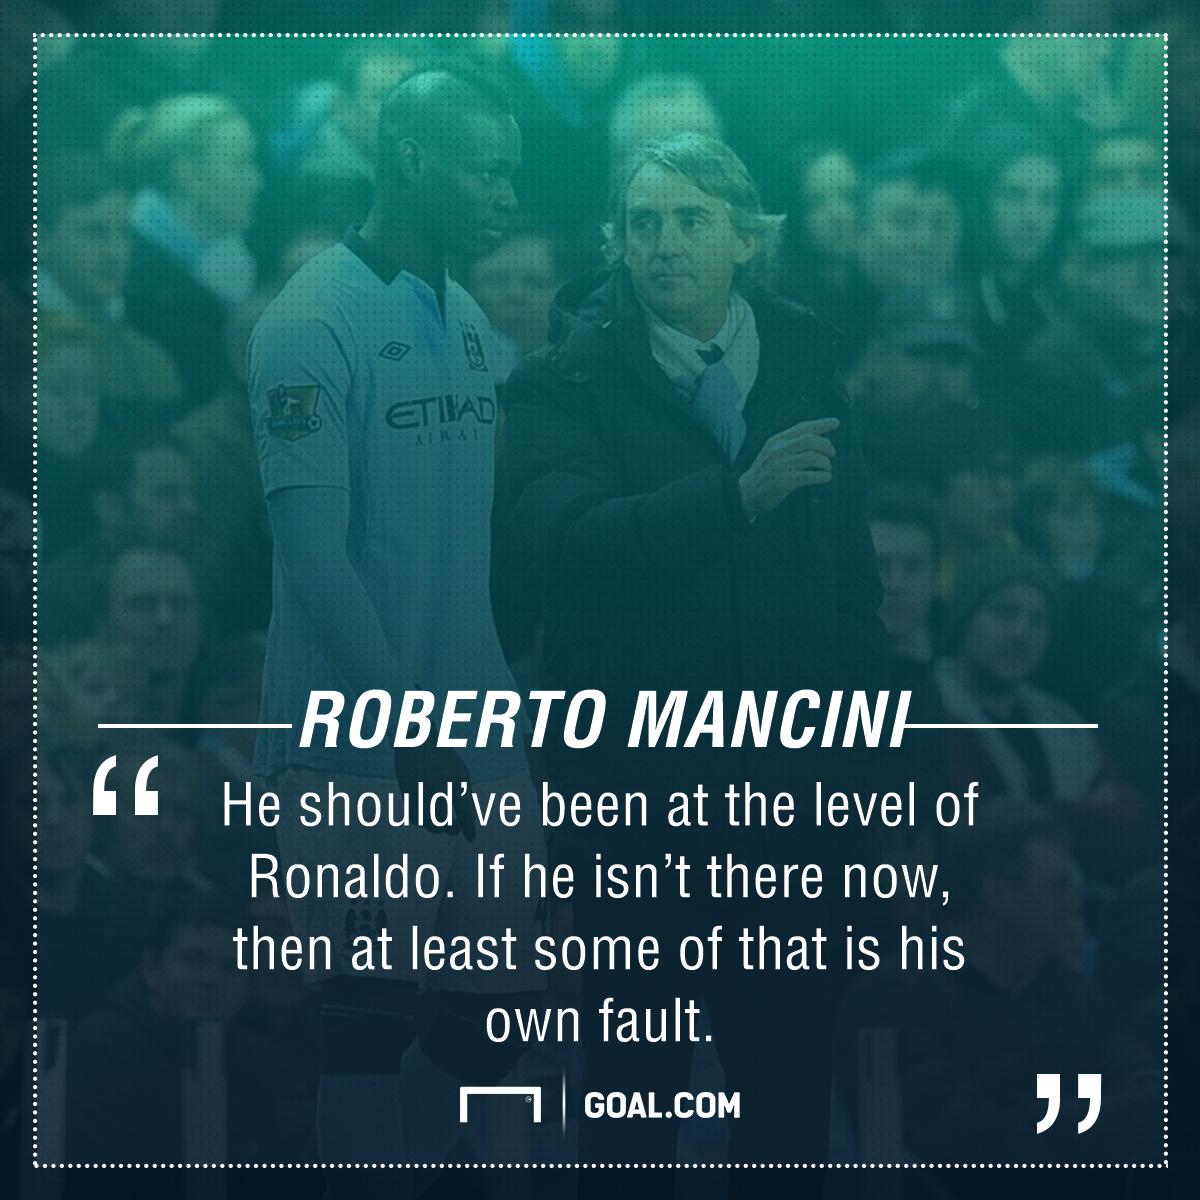 Roberto Mancini Mario Balotelli